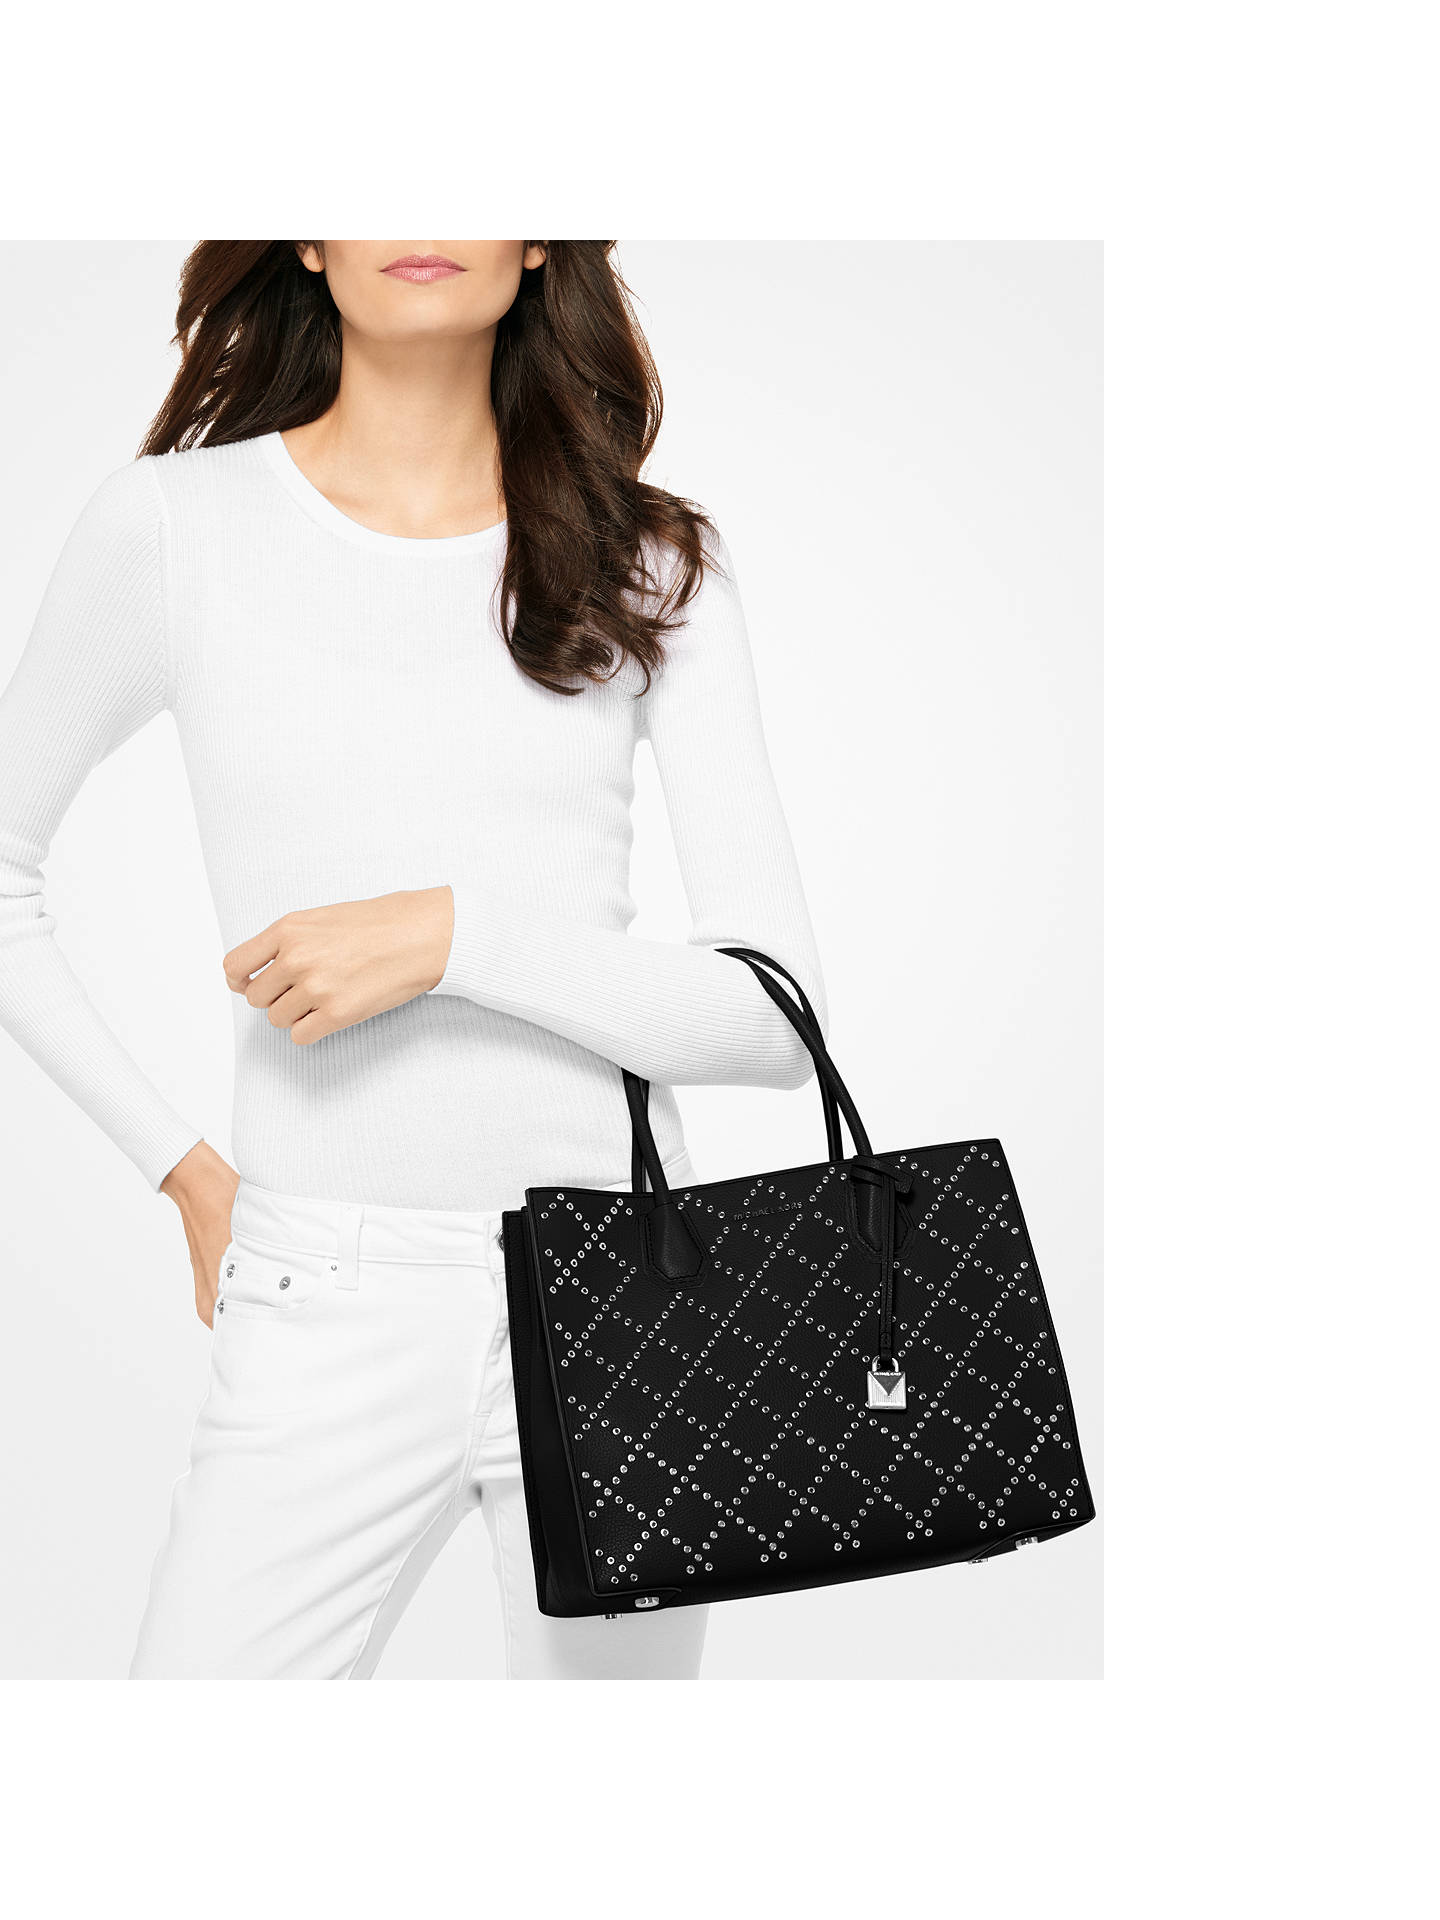 db4c1c190d1268 ... Buy MICHAEL Michael Kors Mercer Stud Large Leather Tote Bag,  Black/Silver Online at